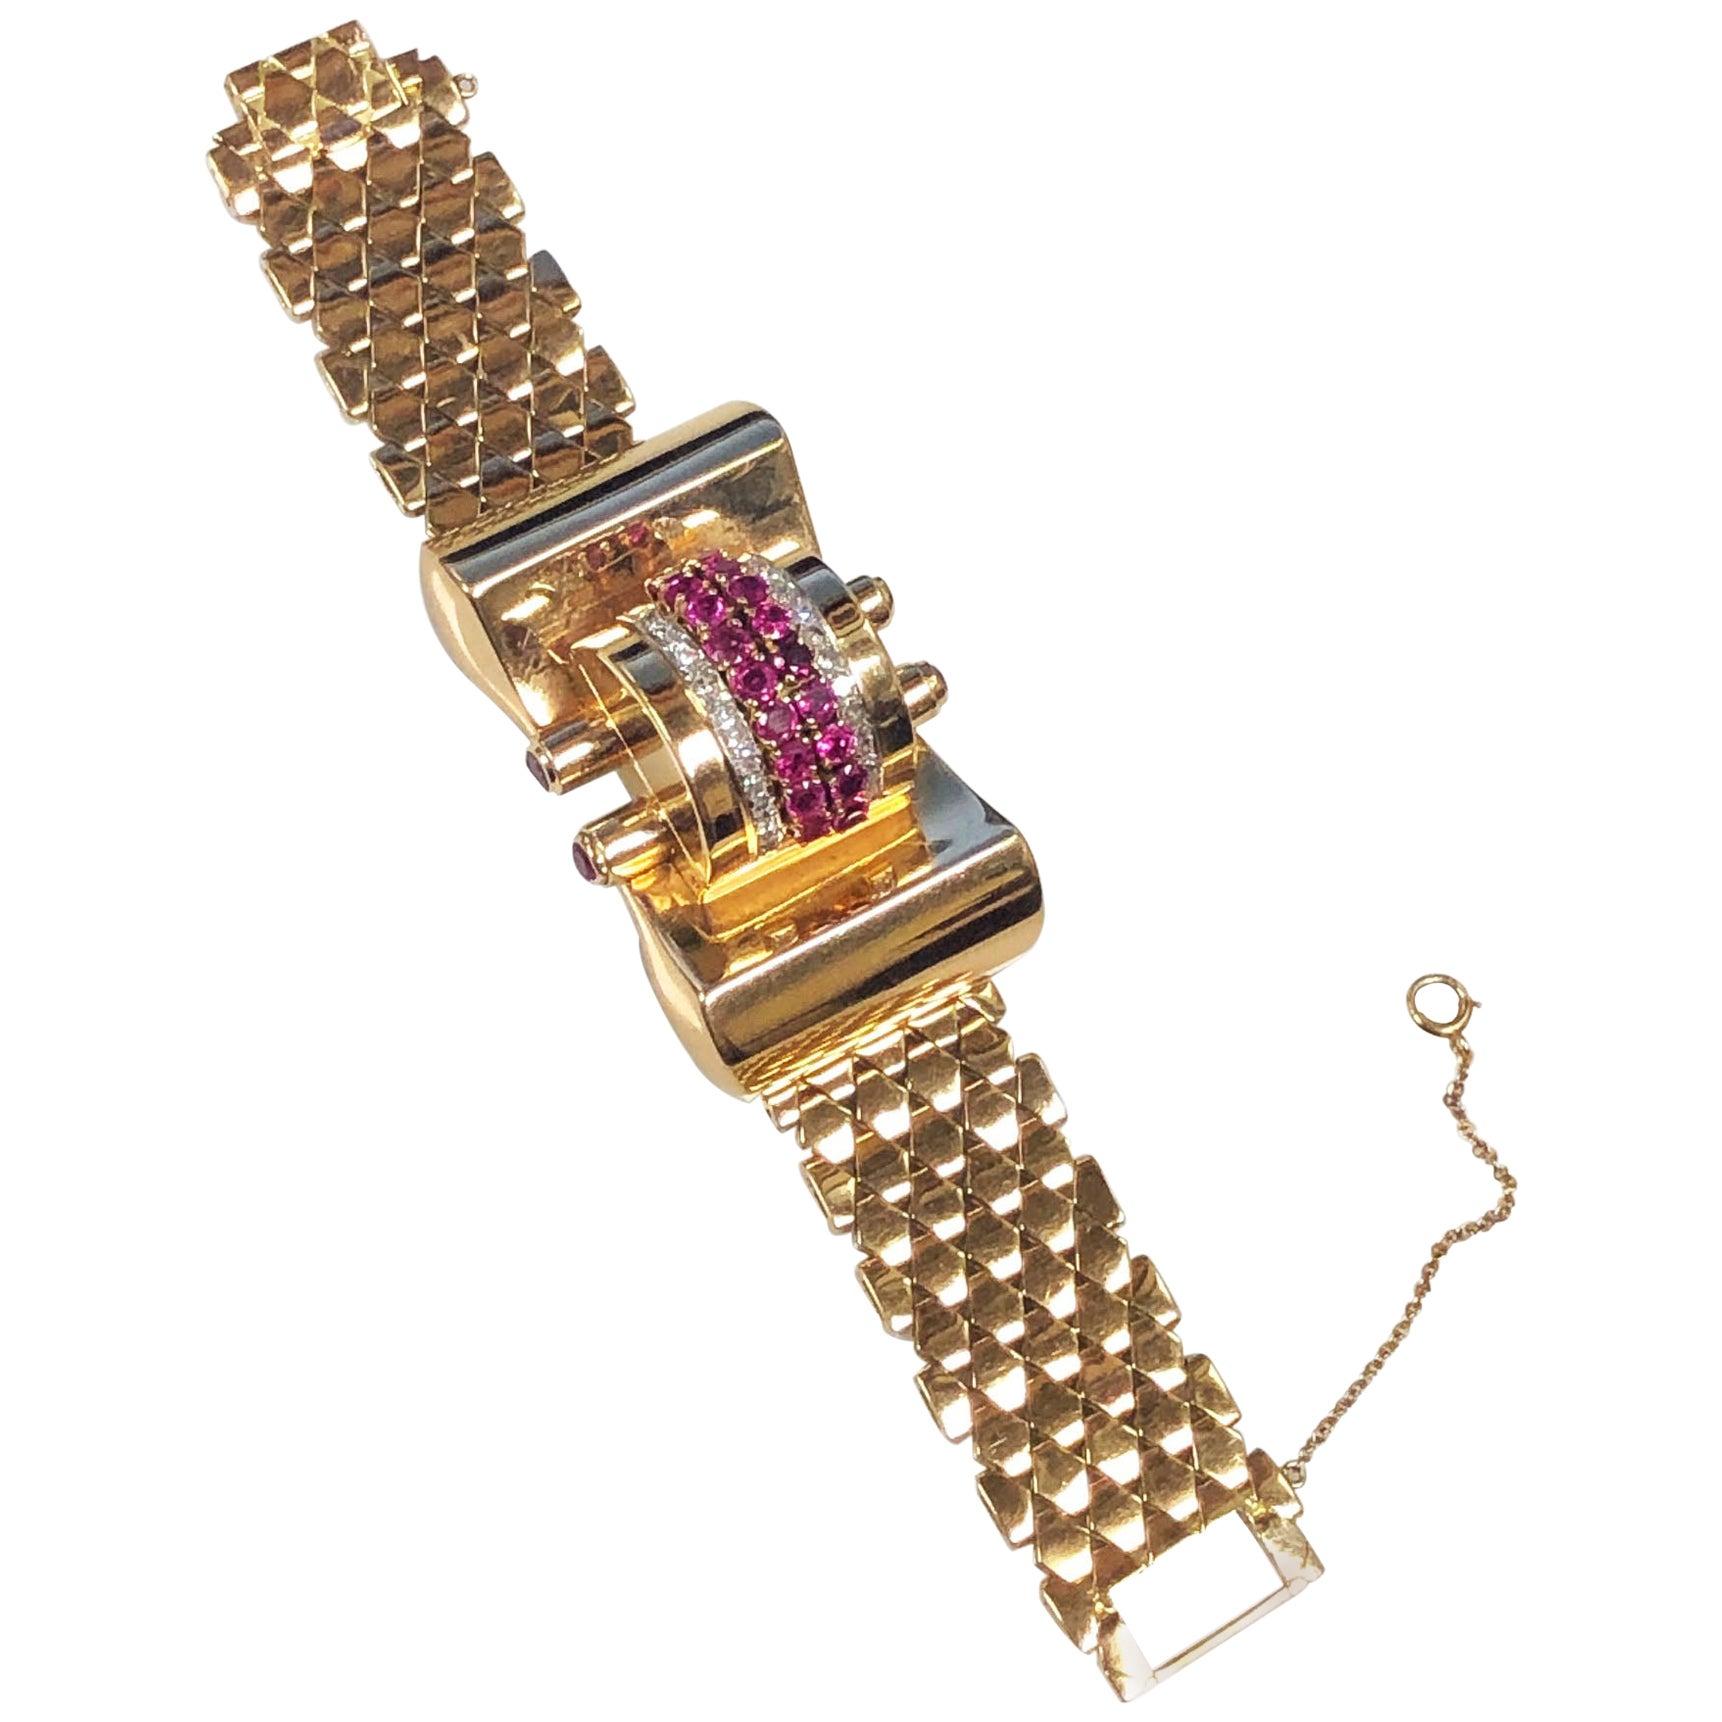 1940s Retro Rose Gold and Gem set Large Hidden Surprise Watch